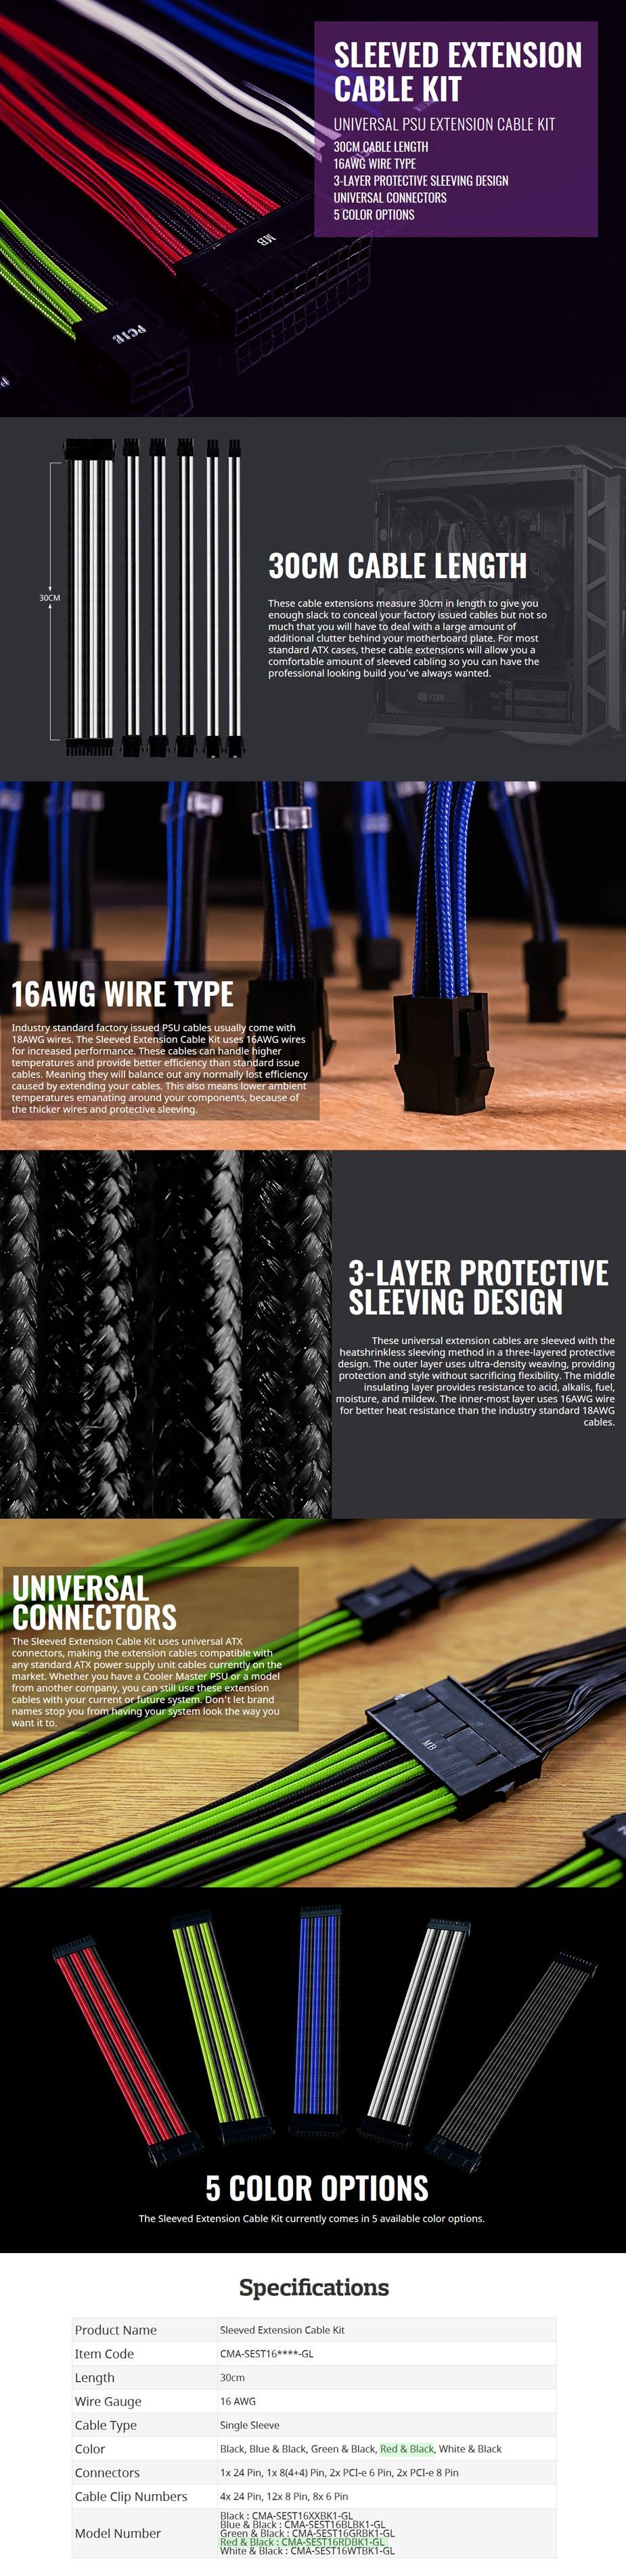 Cooler Master Universal PSU Sleeved Extension Cable Kit - Red/Black - Desktop Overview 1